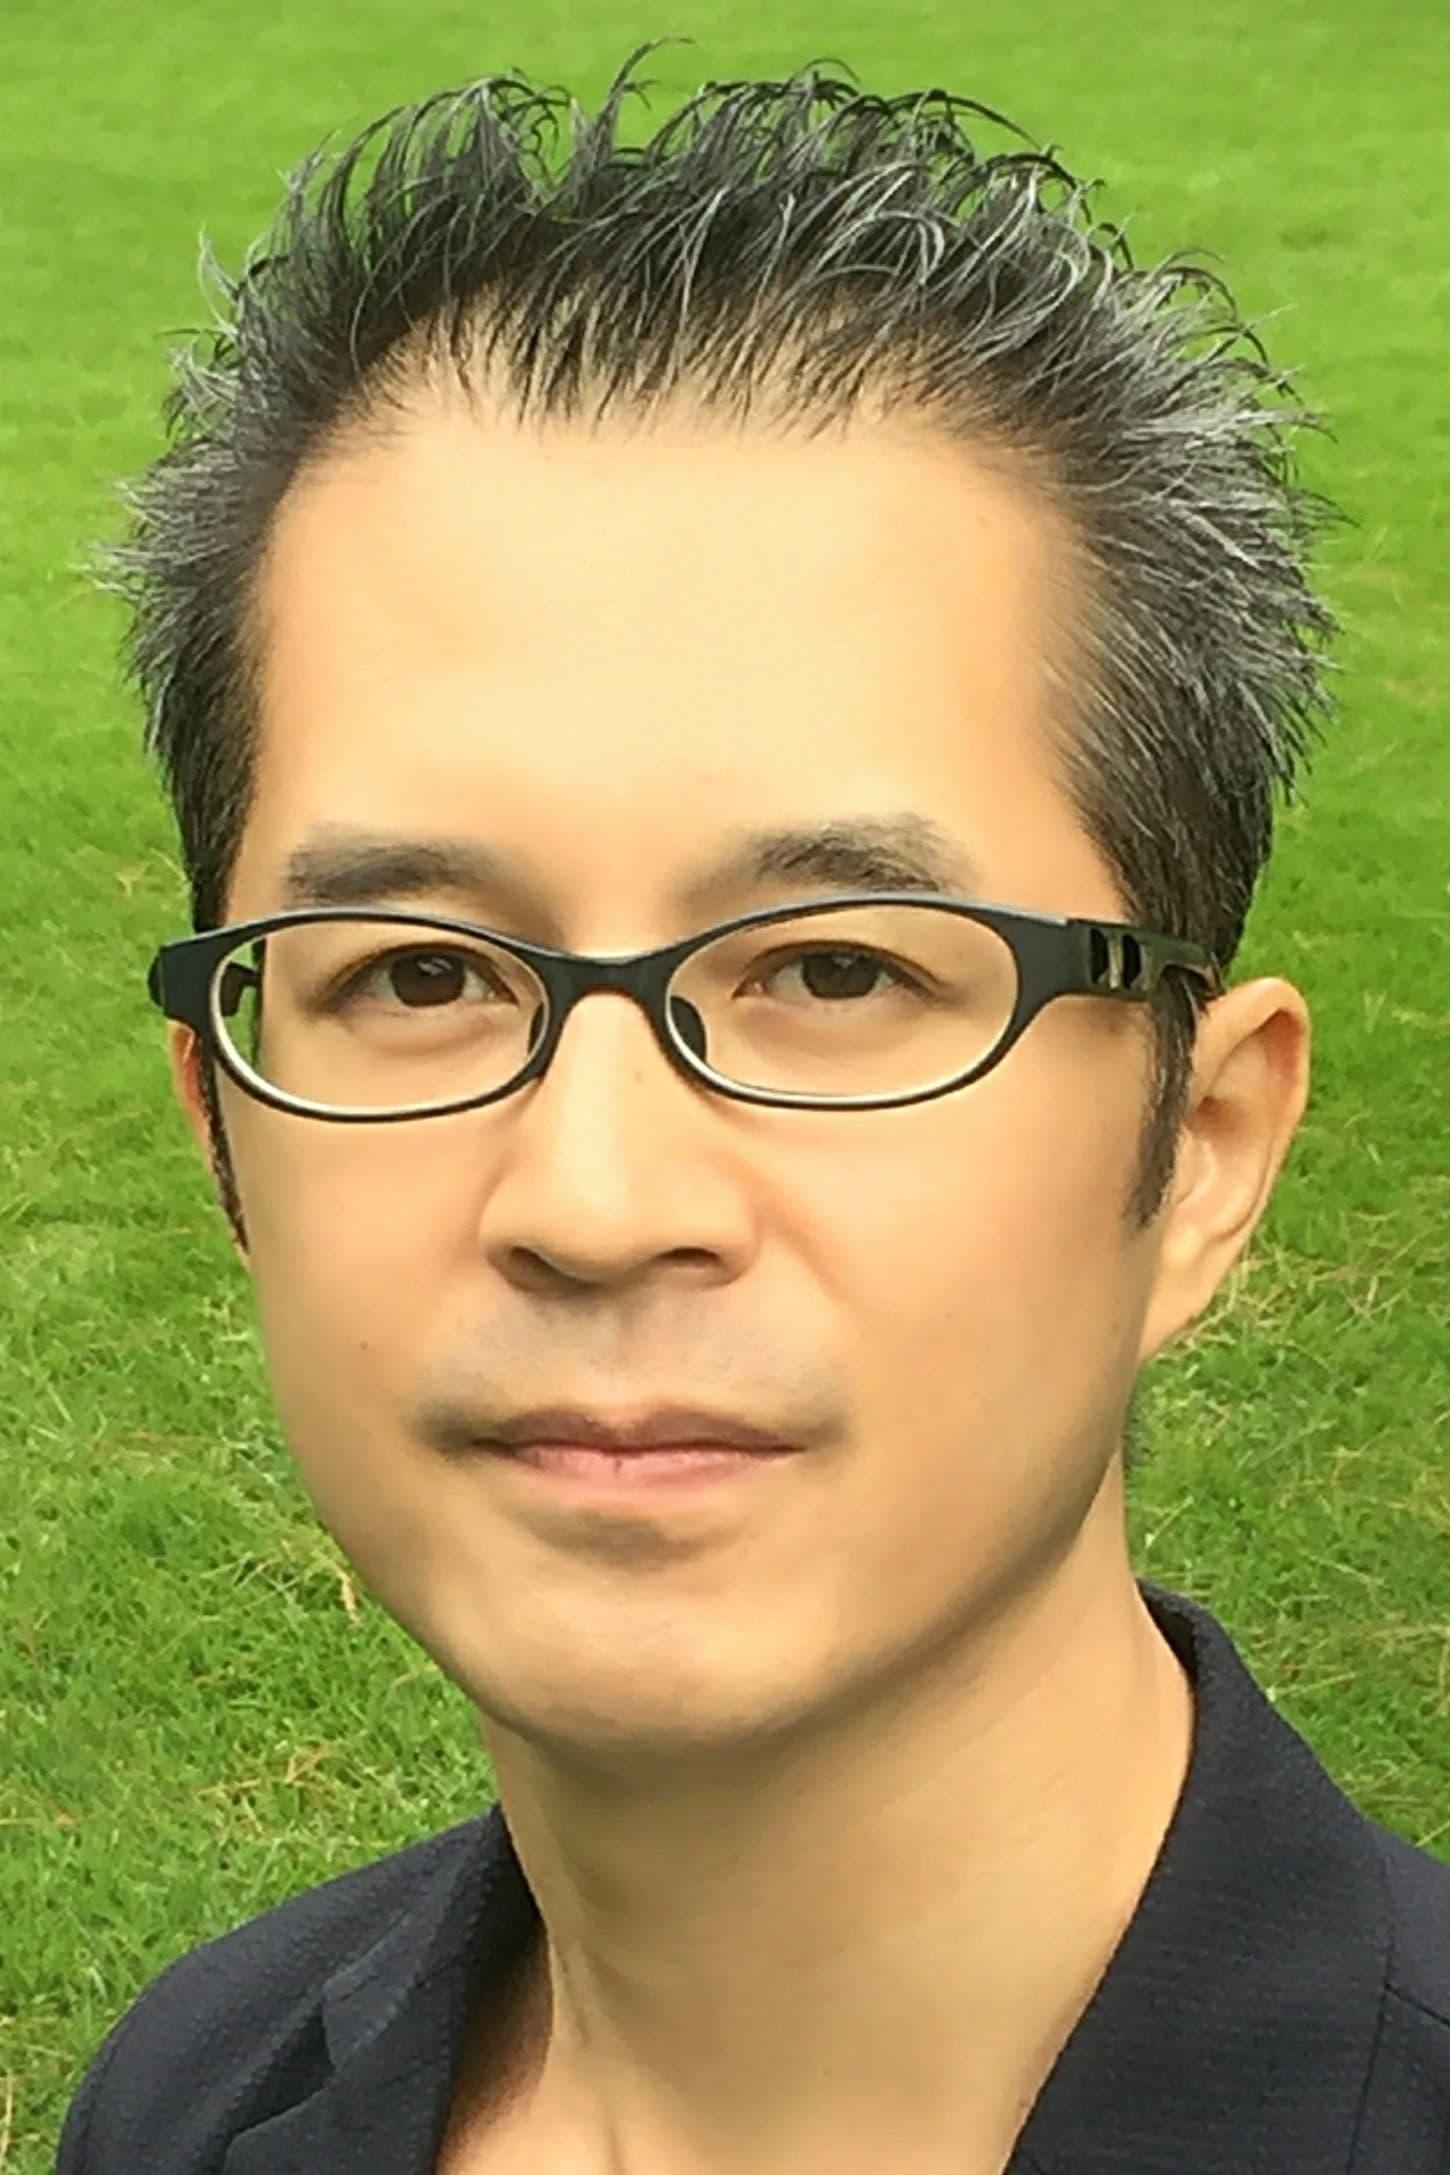 Masahito Kawanago